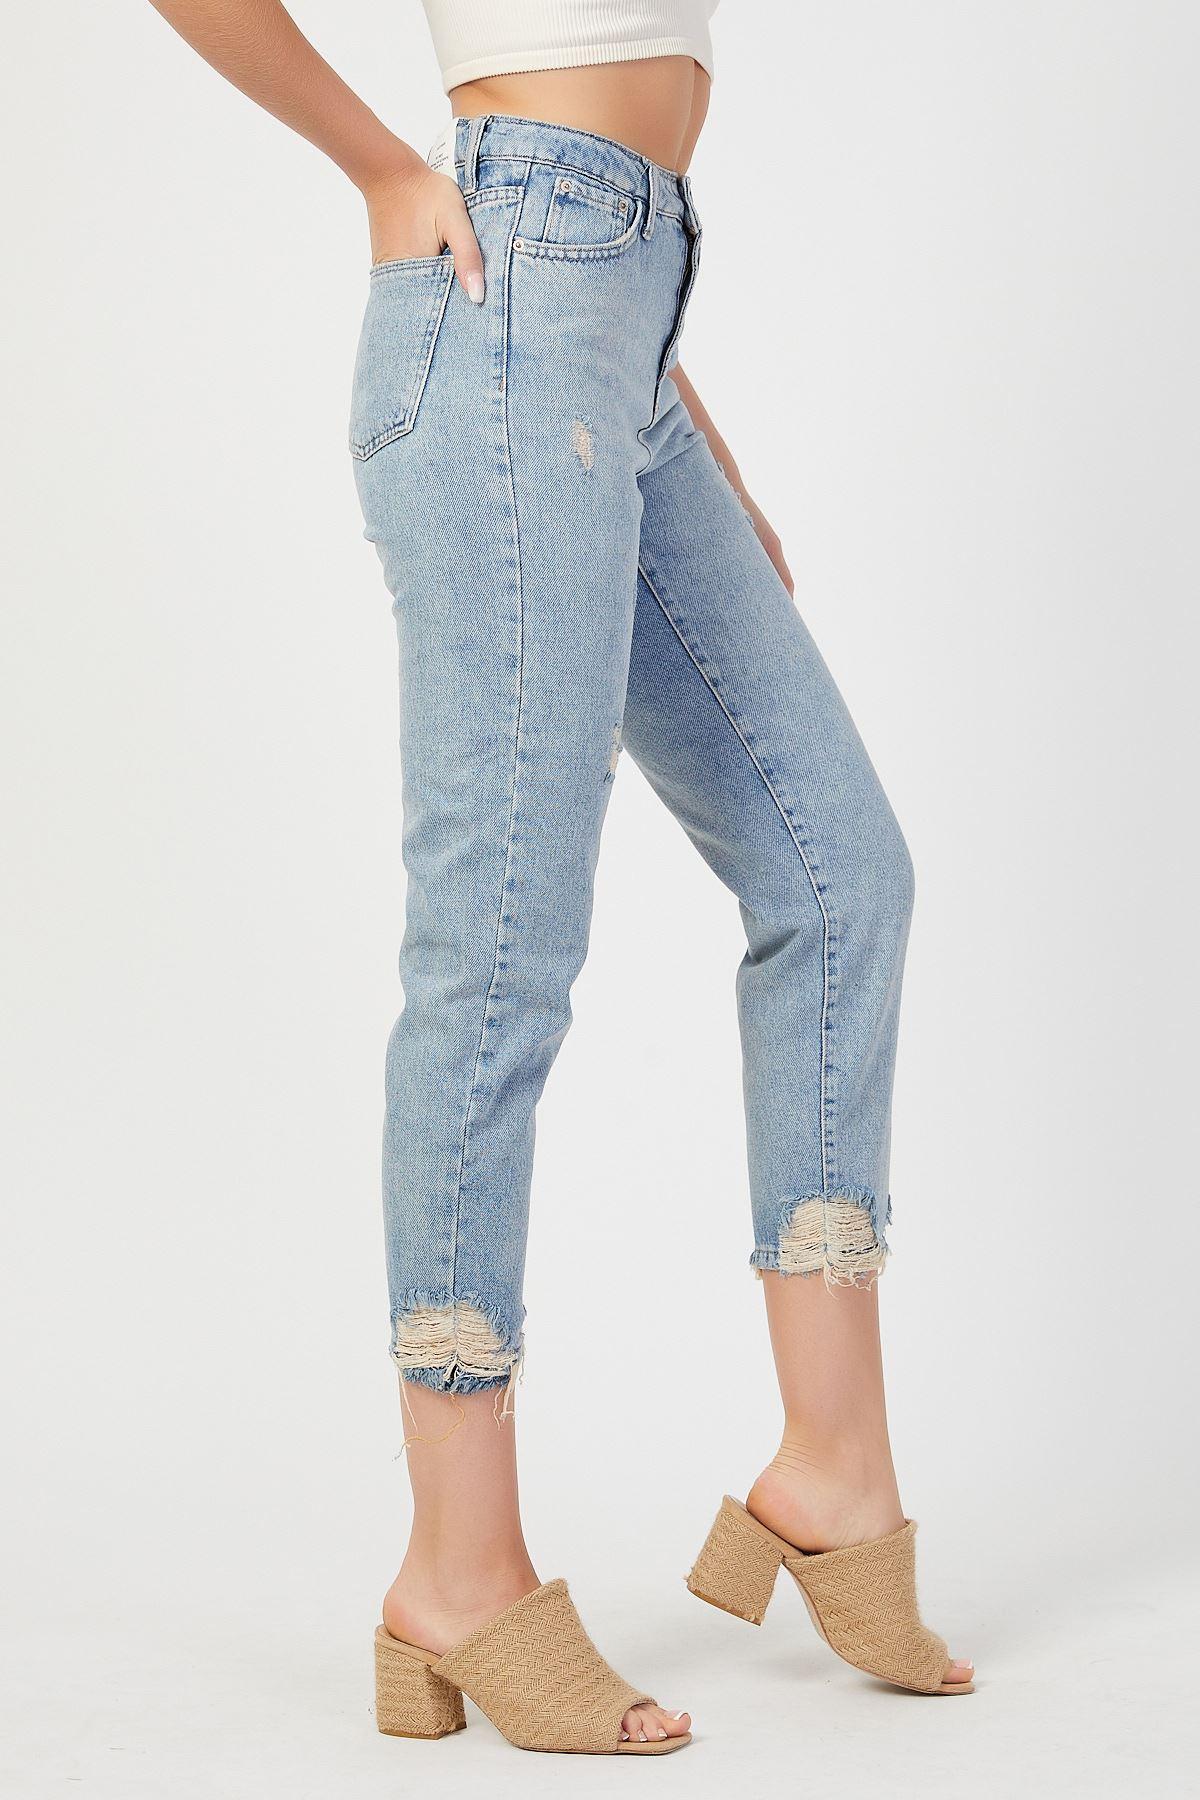 Paça Yıpratmalı Mom Jeans Kot Pantolon